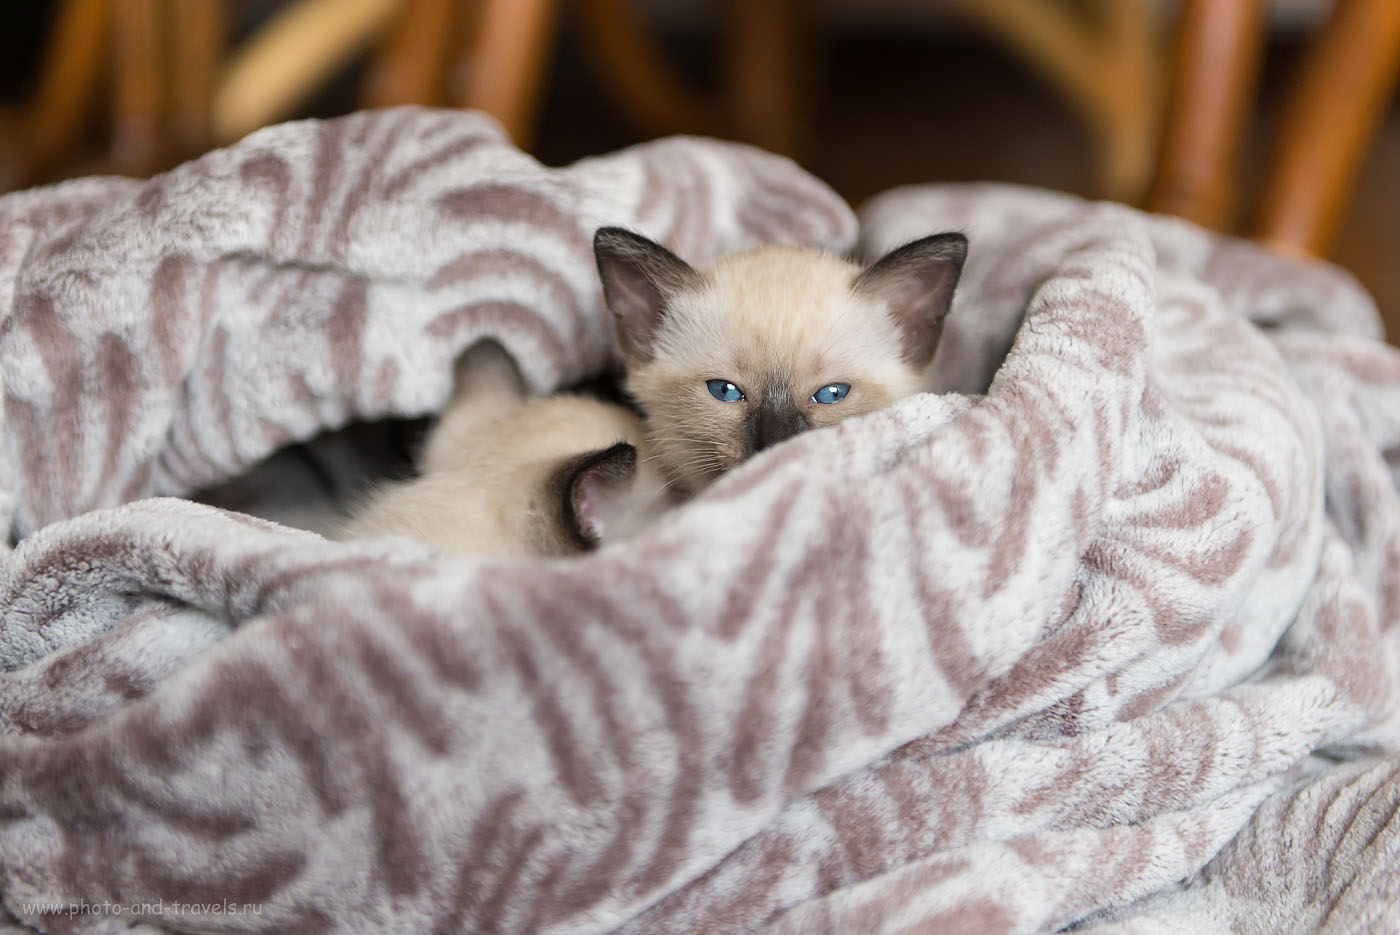 Фотография 16. Съемка котят дома. Близится сон-час... (1000, 70, 2.8, 1/250)